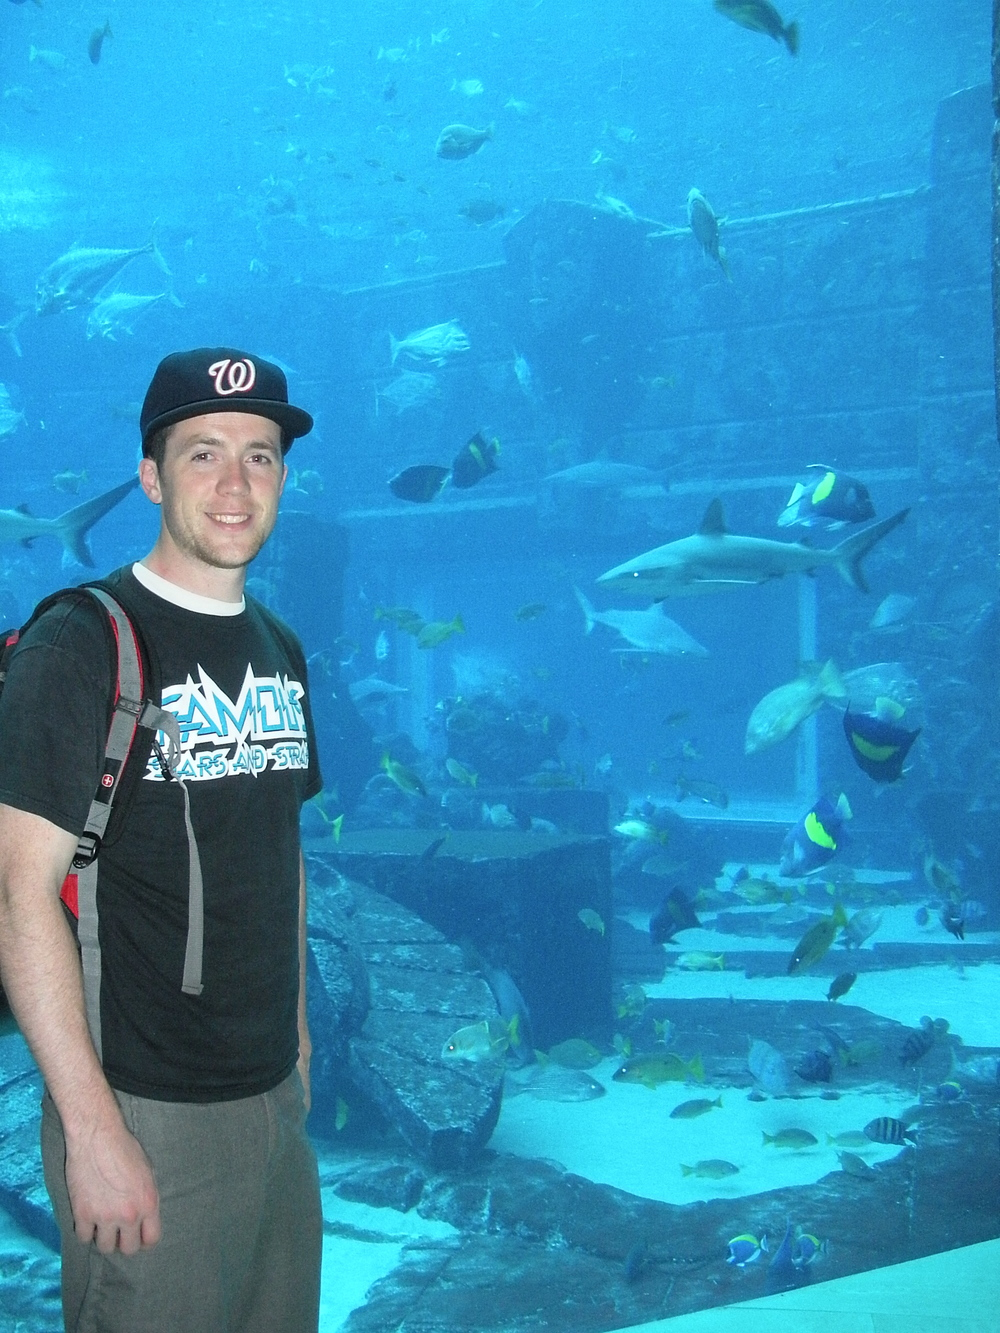 Wishing I had my scuba gear